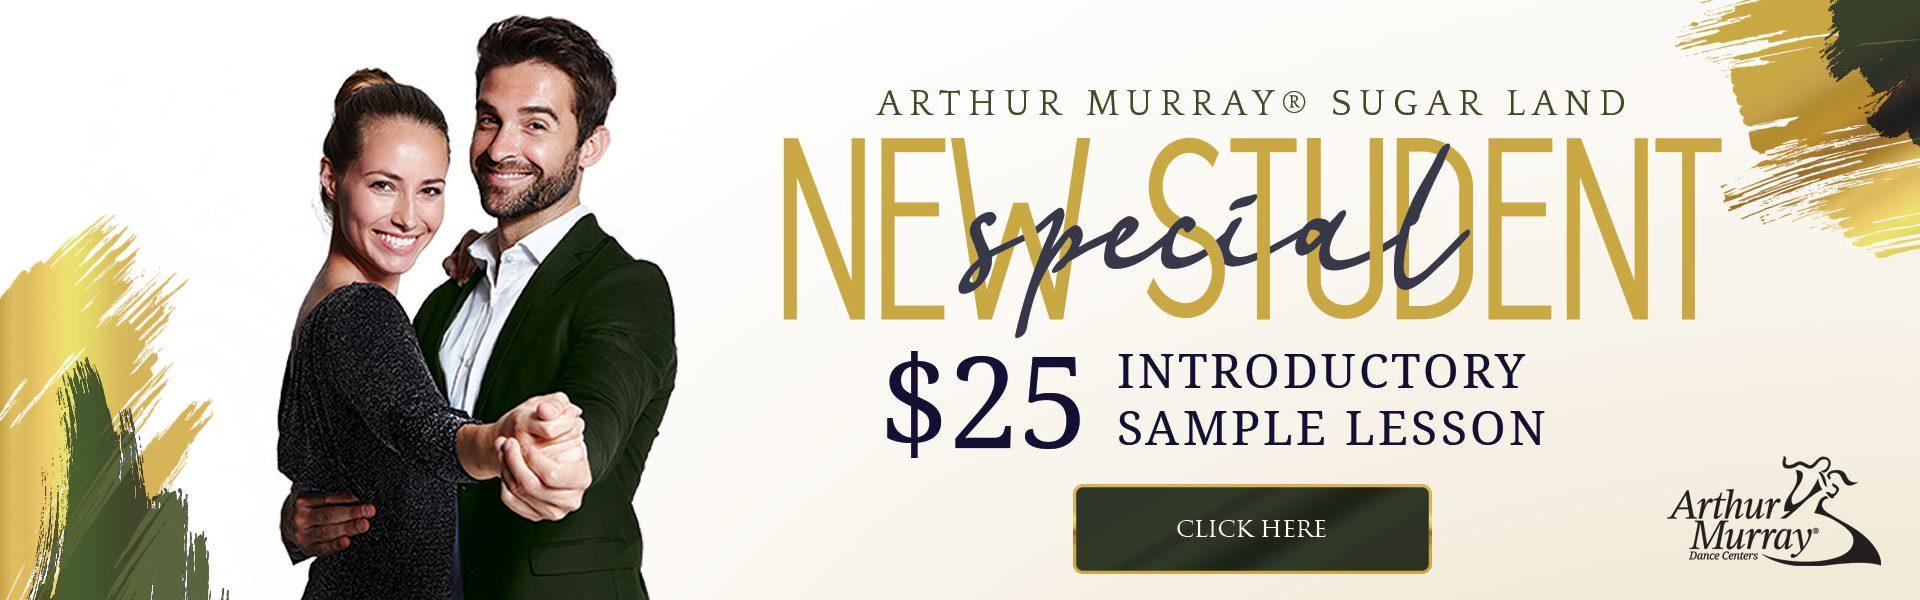 Arthur Murray Sugar Land New Student Offer